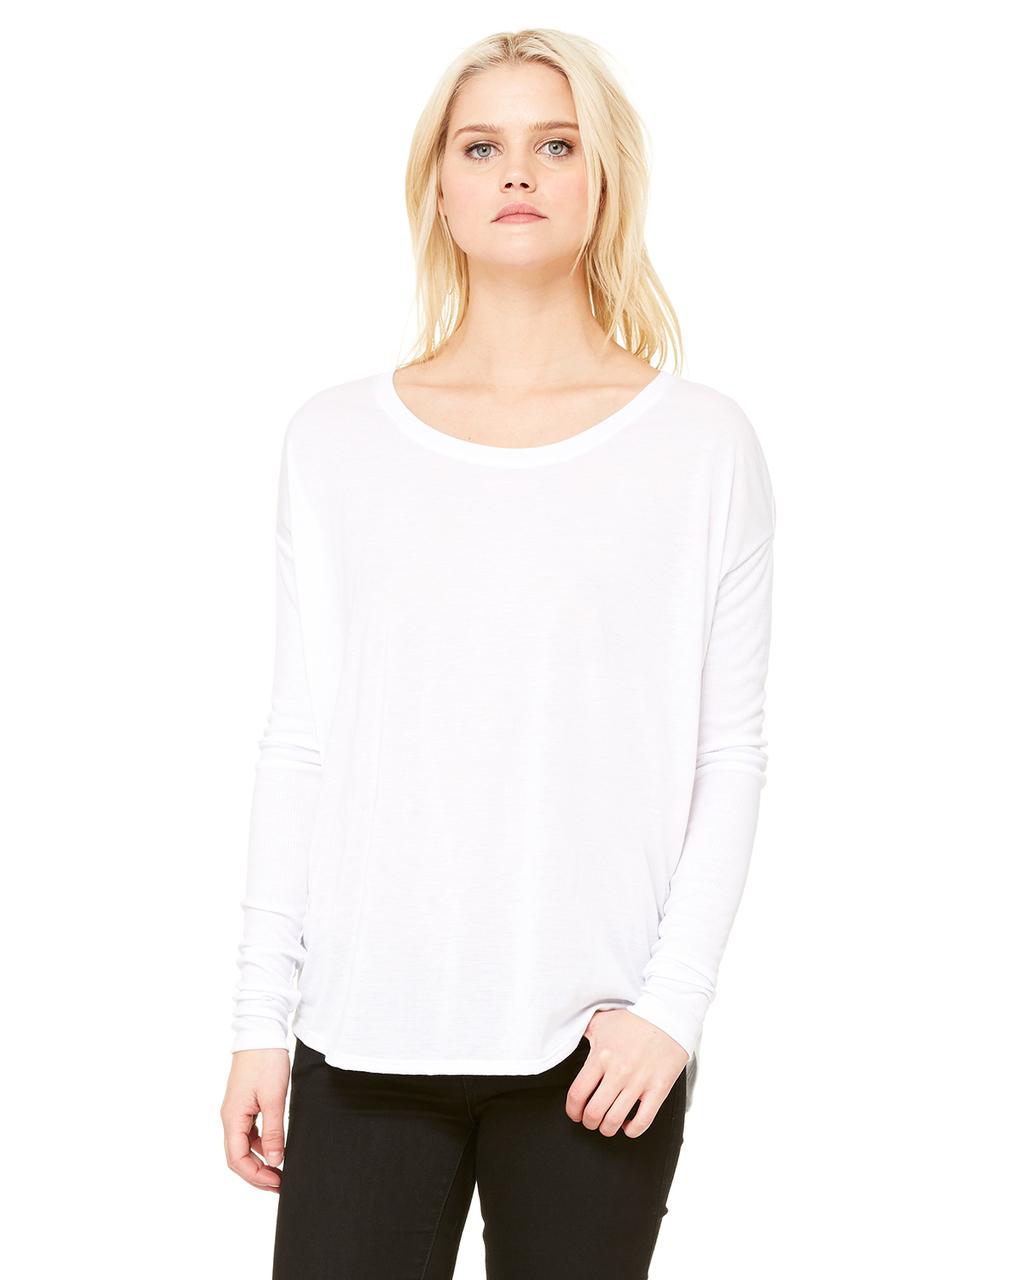 Bella Ladies' Flowy Long-Sleeve T-Shirt with 2x1 Sleeves